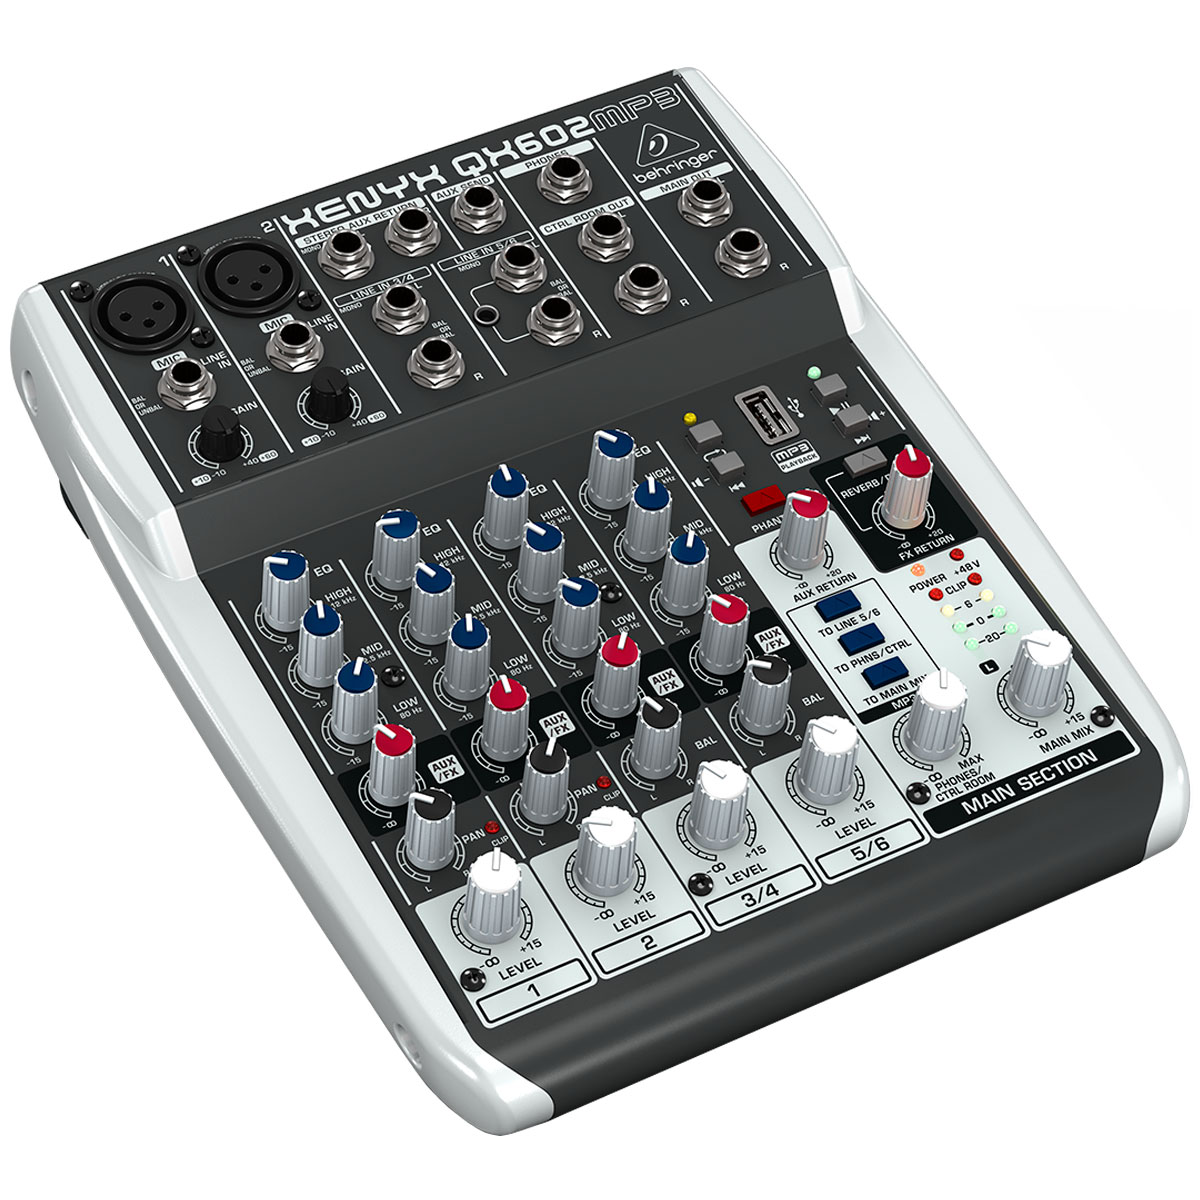 Mesa de Som 6 Canais Balanceados (2 XLR + 4 P10) c/ USB / Efeito / Phantom / 1 Auxiliar - Xenyx QX 602 MP3 Behringer